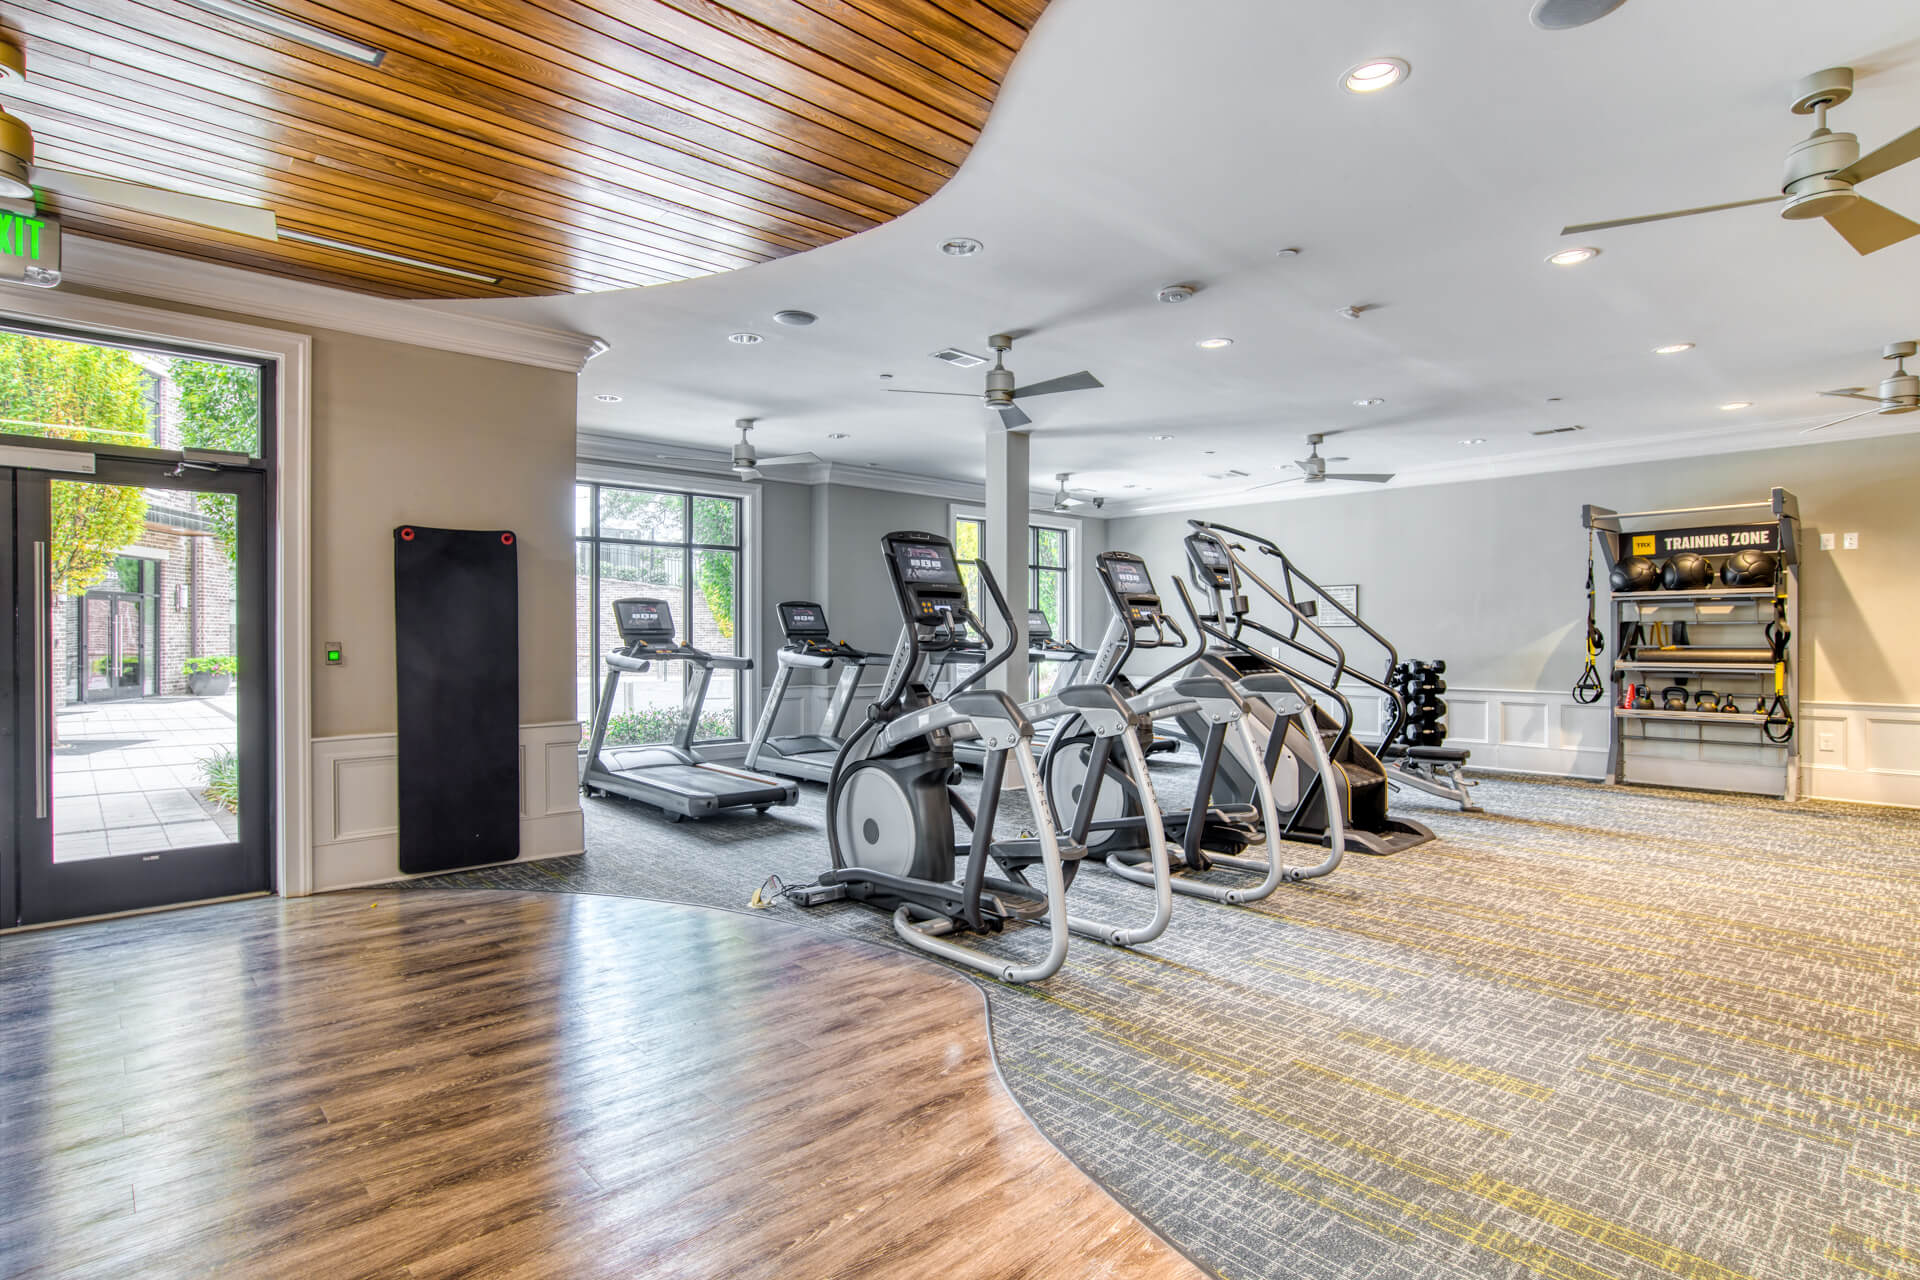 Fitness Center with TRX Training Zone at Windsor Chastain, Atlanta, Georgia